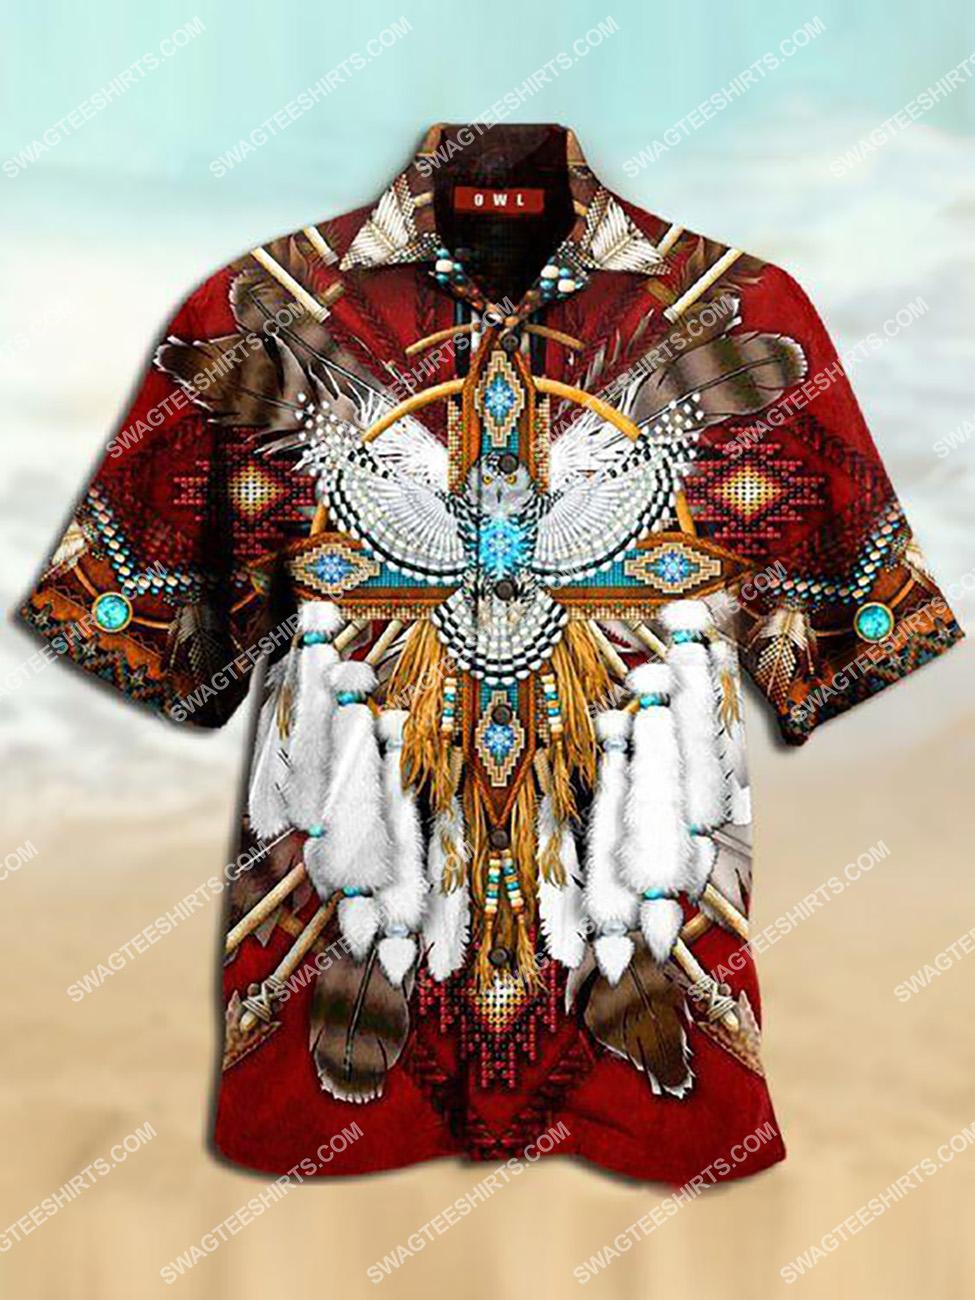 the native american owl all over printed hawaiian shirt 1(1)